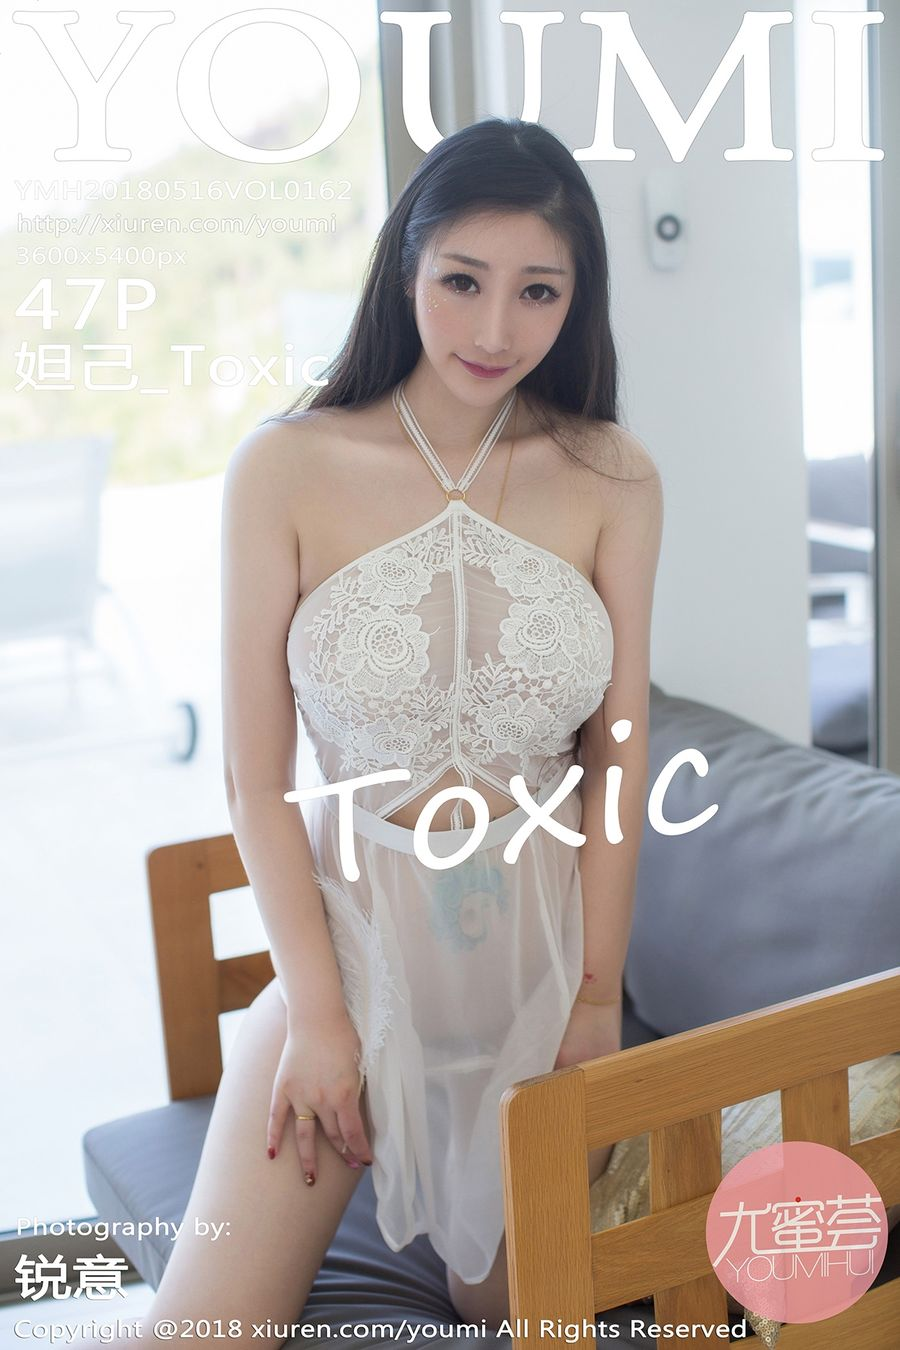 [YOUMI尤蜜荟] VOL.162 妲己_Toxic [47+1P/121M]